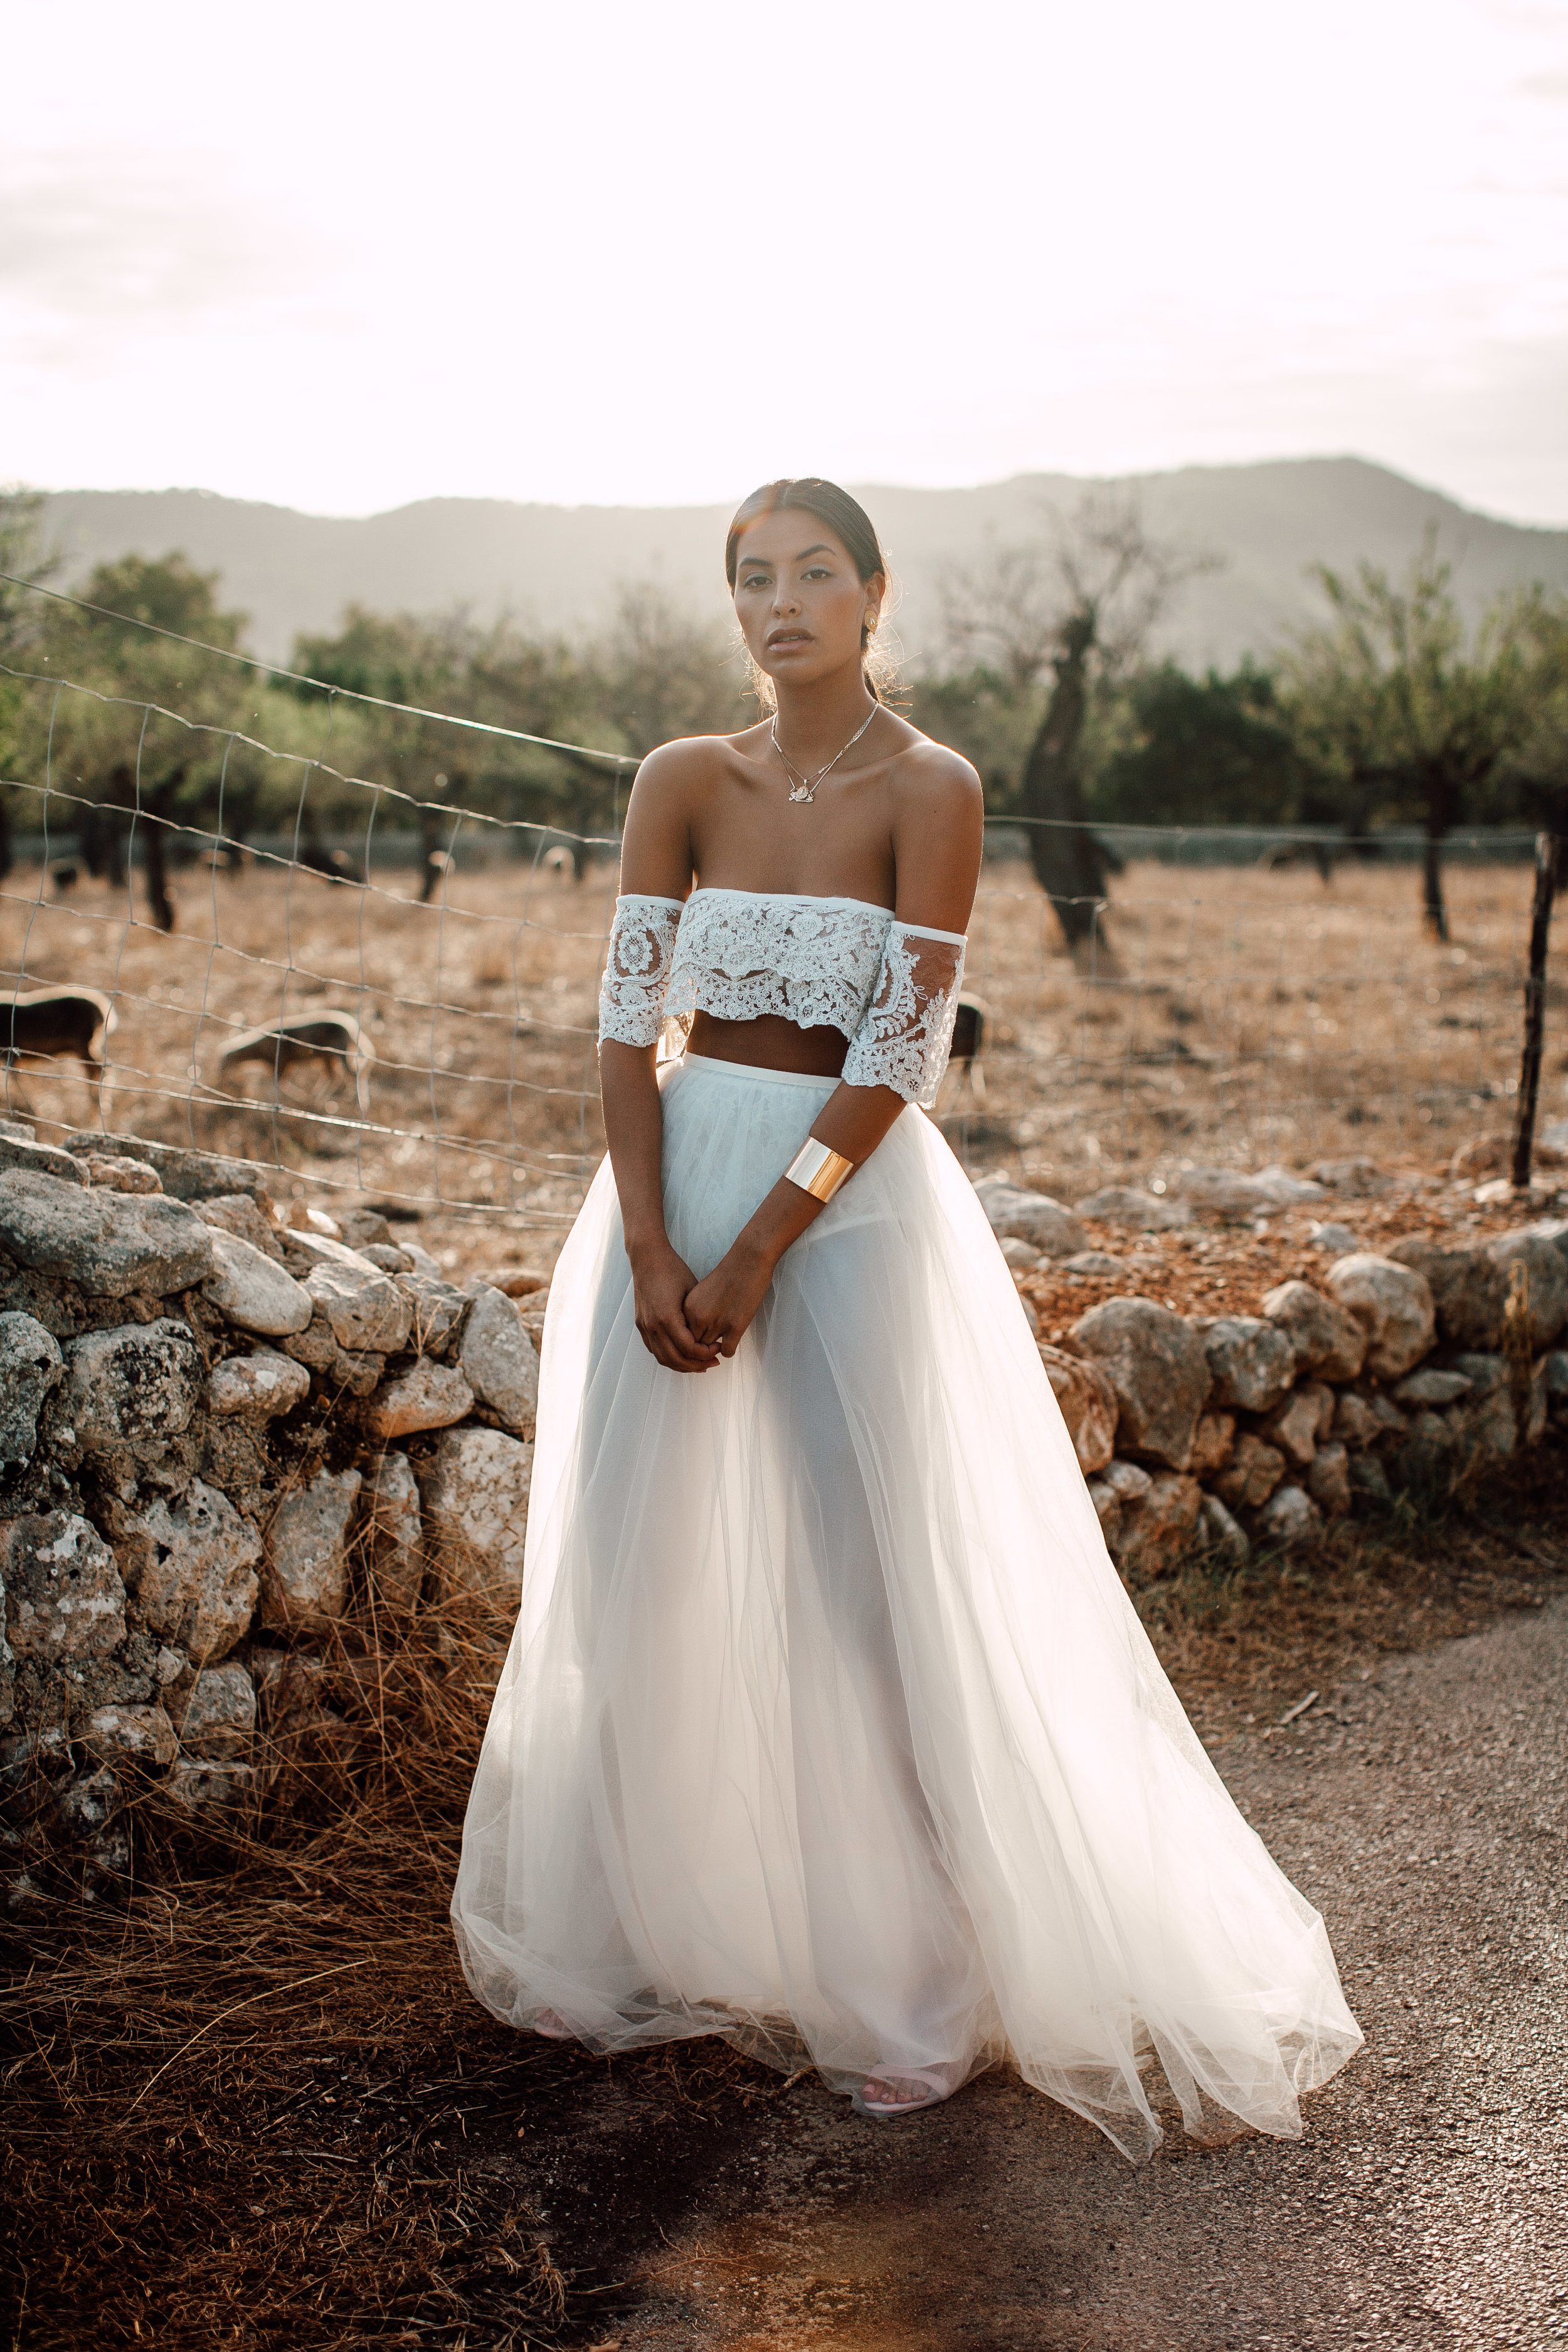 Mallorca-Hochzeit-Pia-Anna-Christian-Wedding-Photography-G-3.jpg